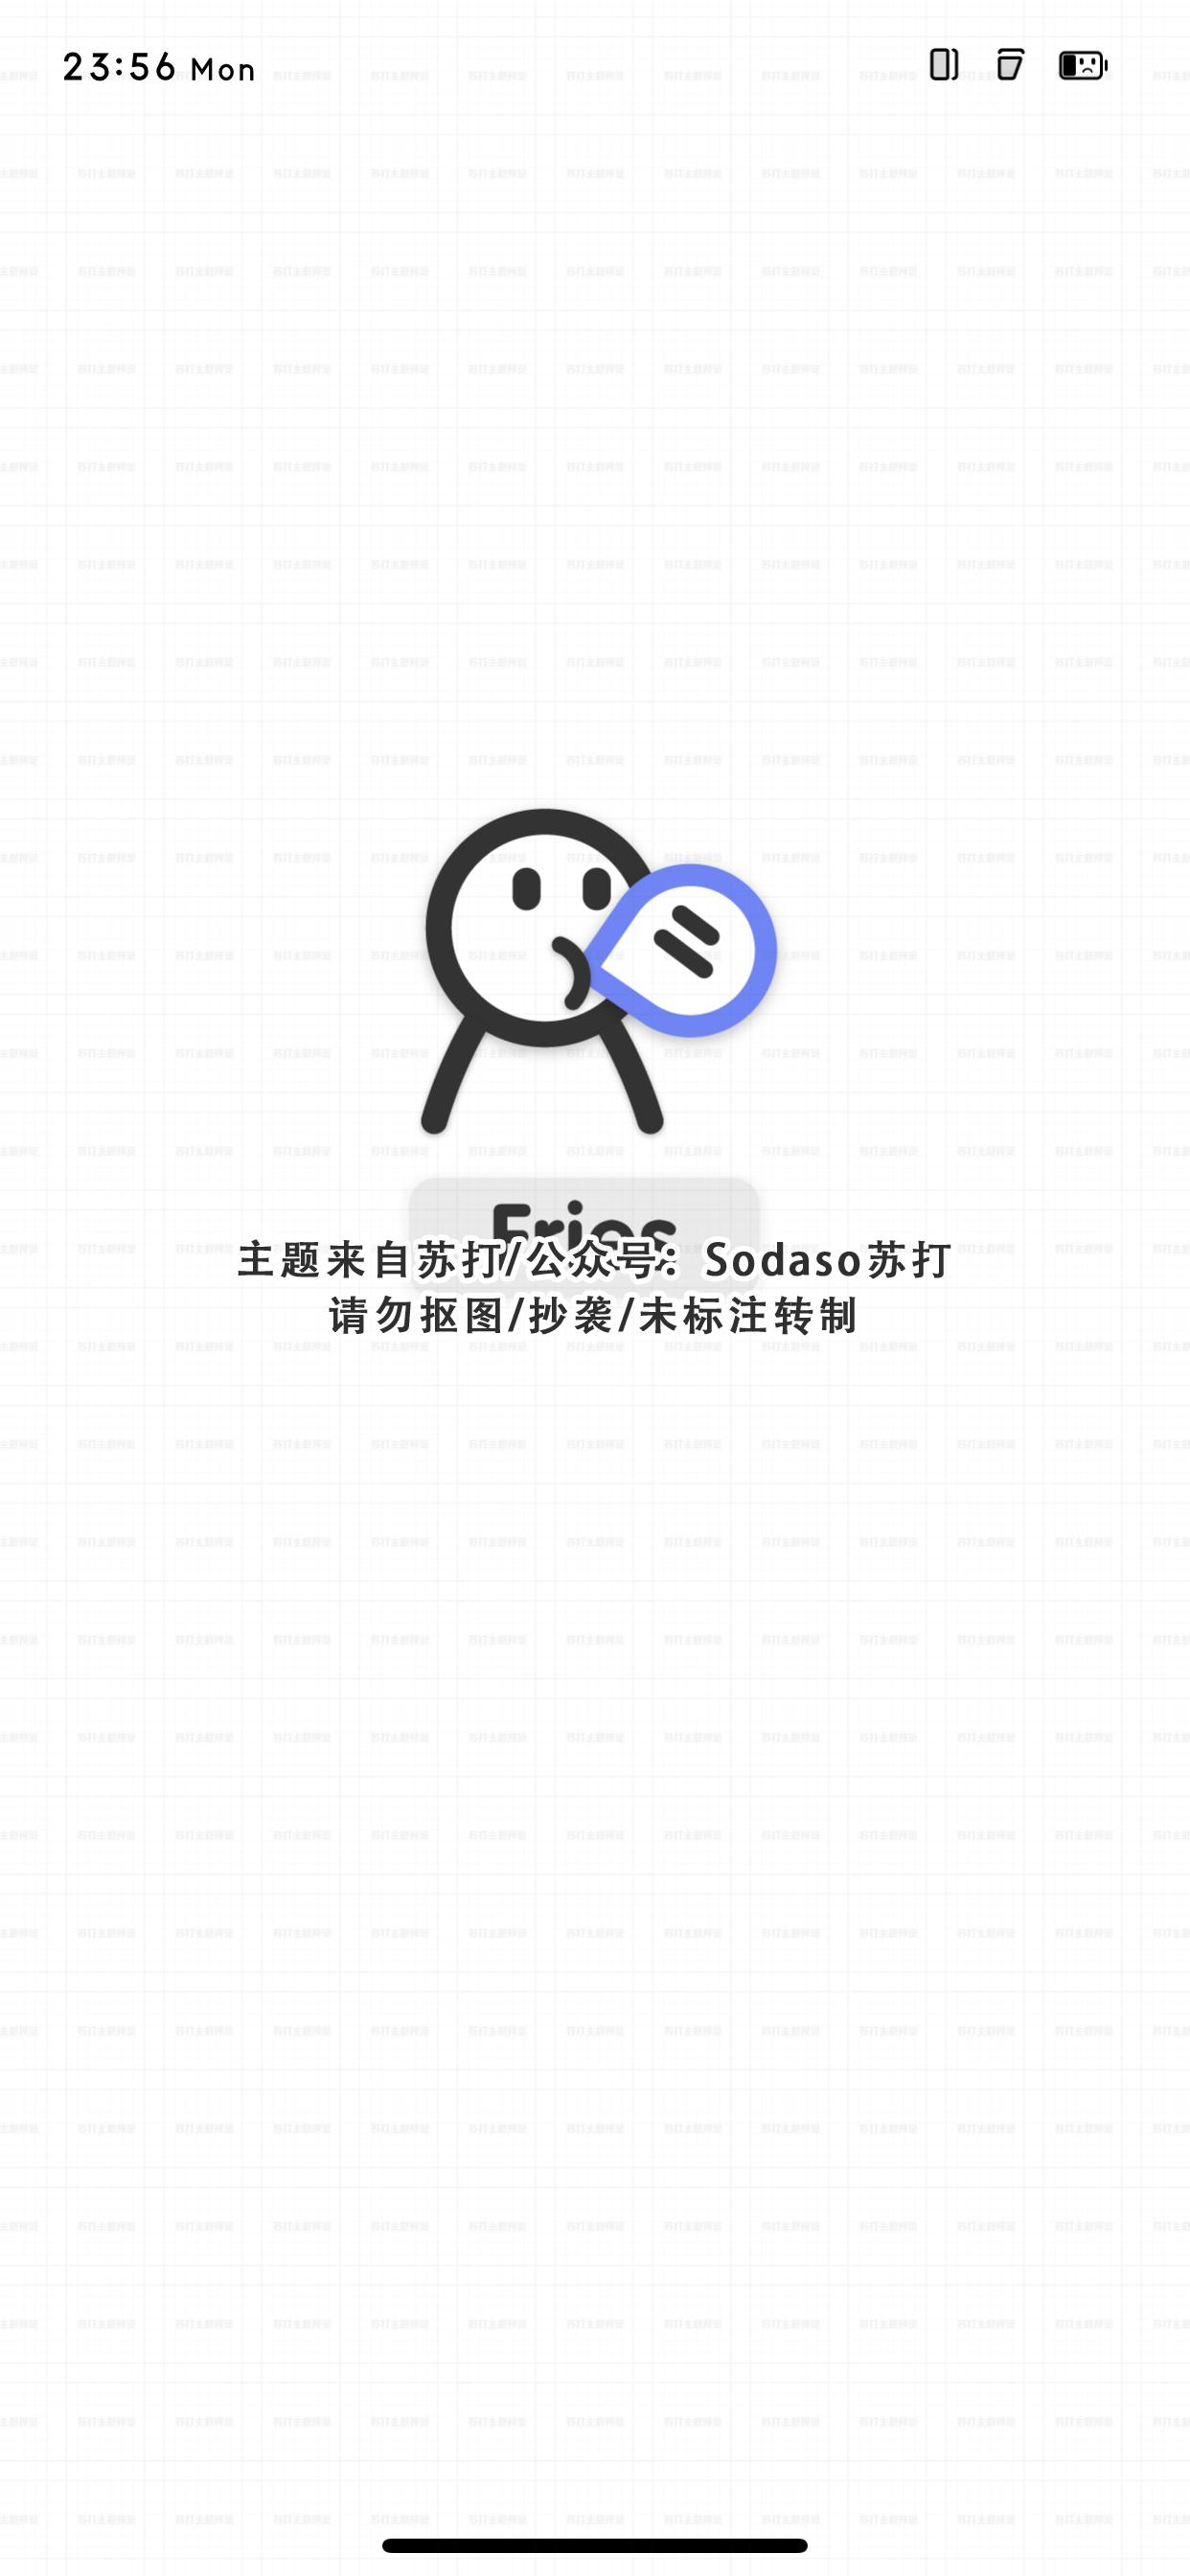 FriesColor WeChatTheme(微信主题) - 1.0